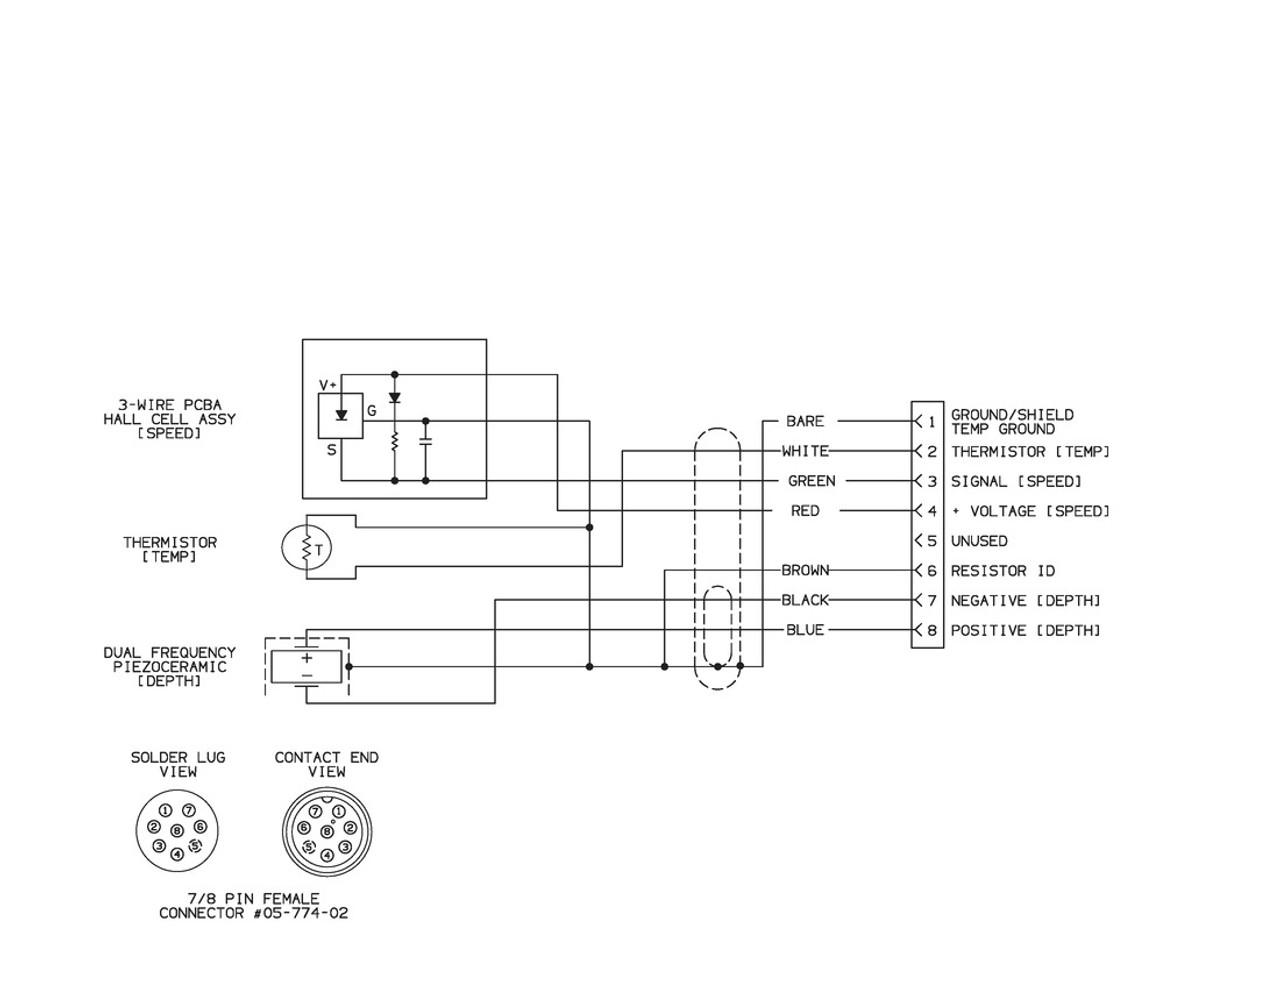 airmar wiring diagram garmin p66 600w s d t blue bottle marine [ 1280 x 989 Pixel ]